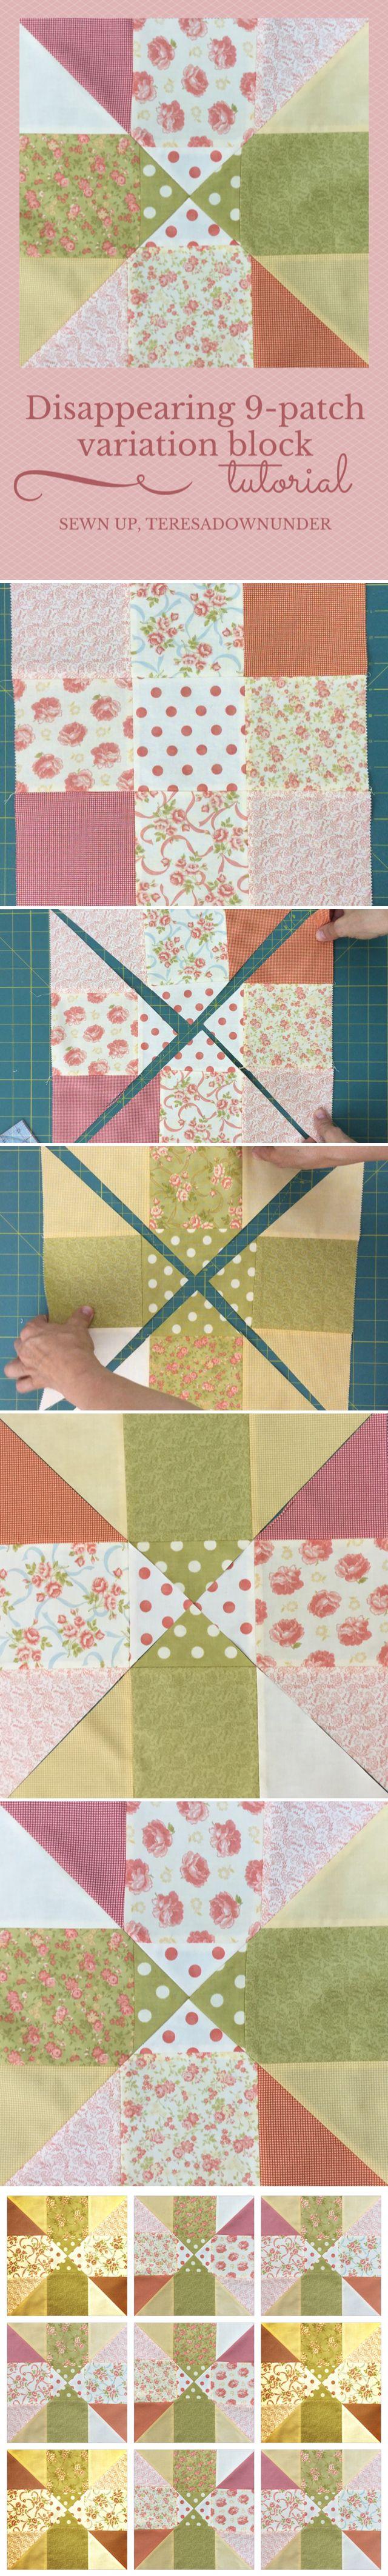 31 best Quilt tutorials images on Pinterest